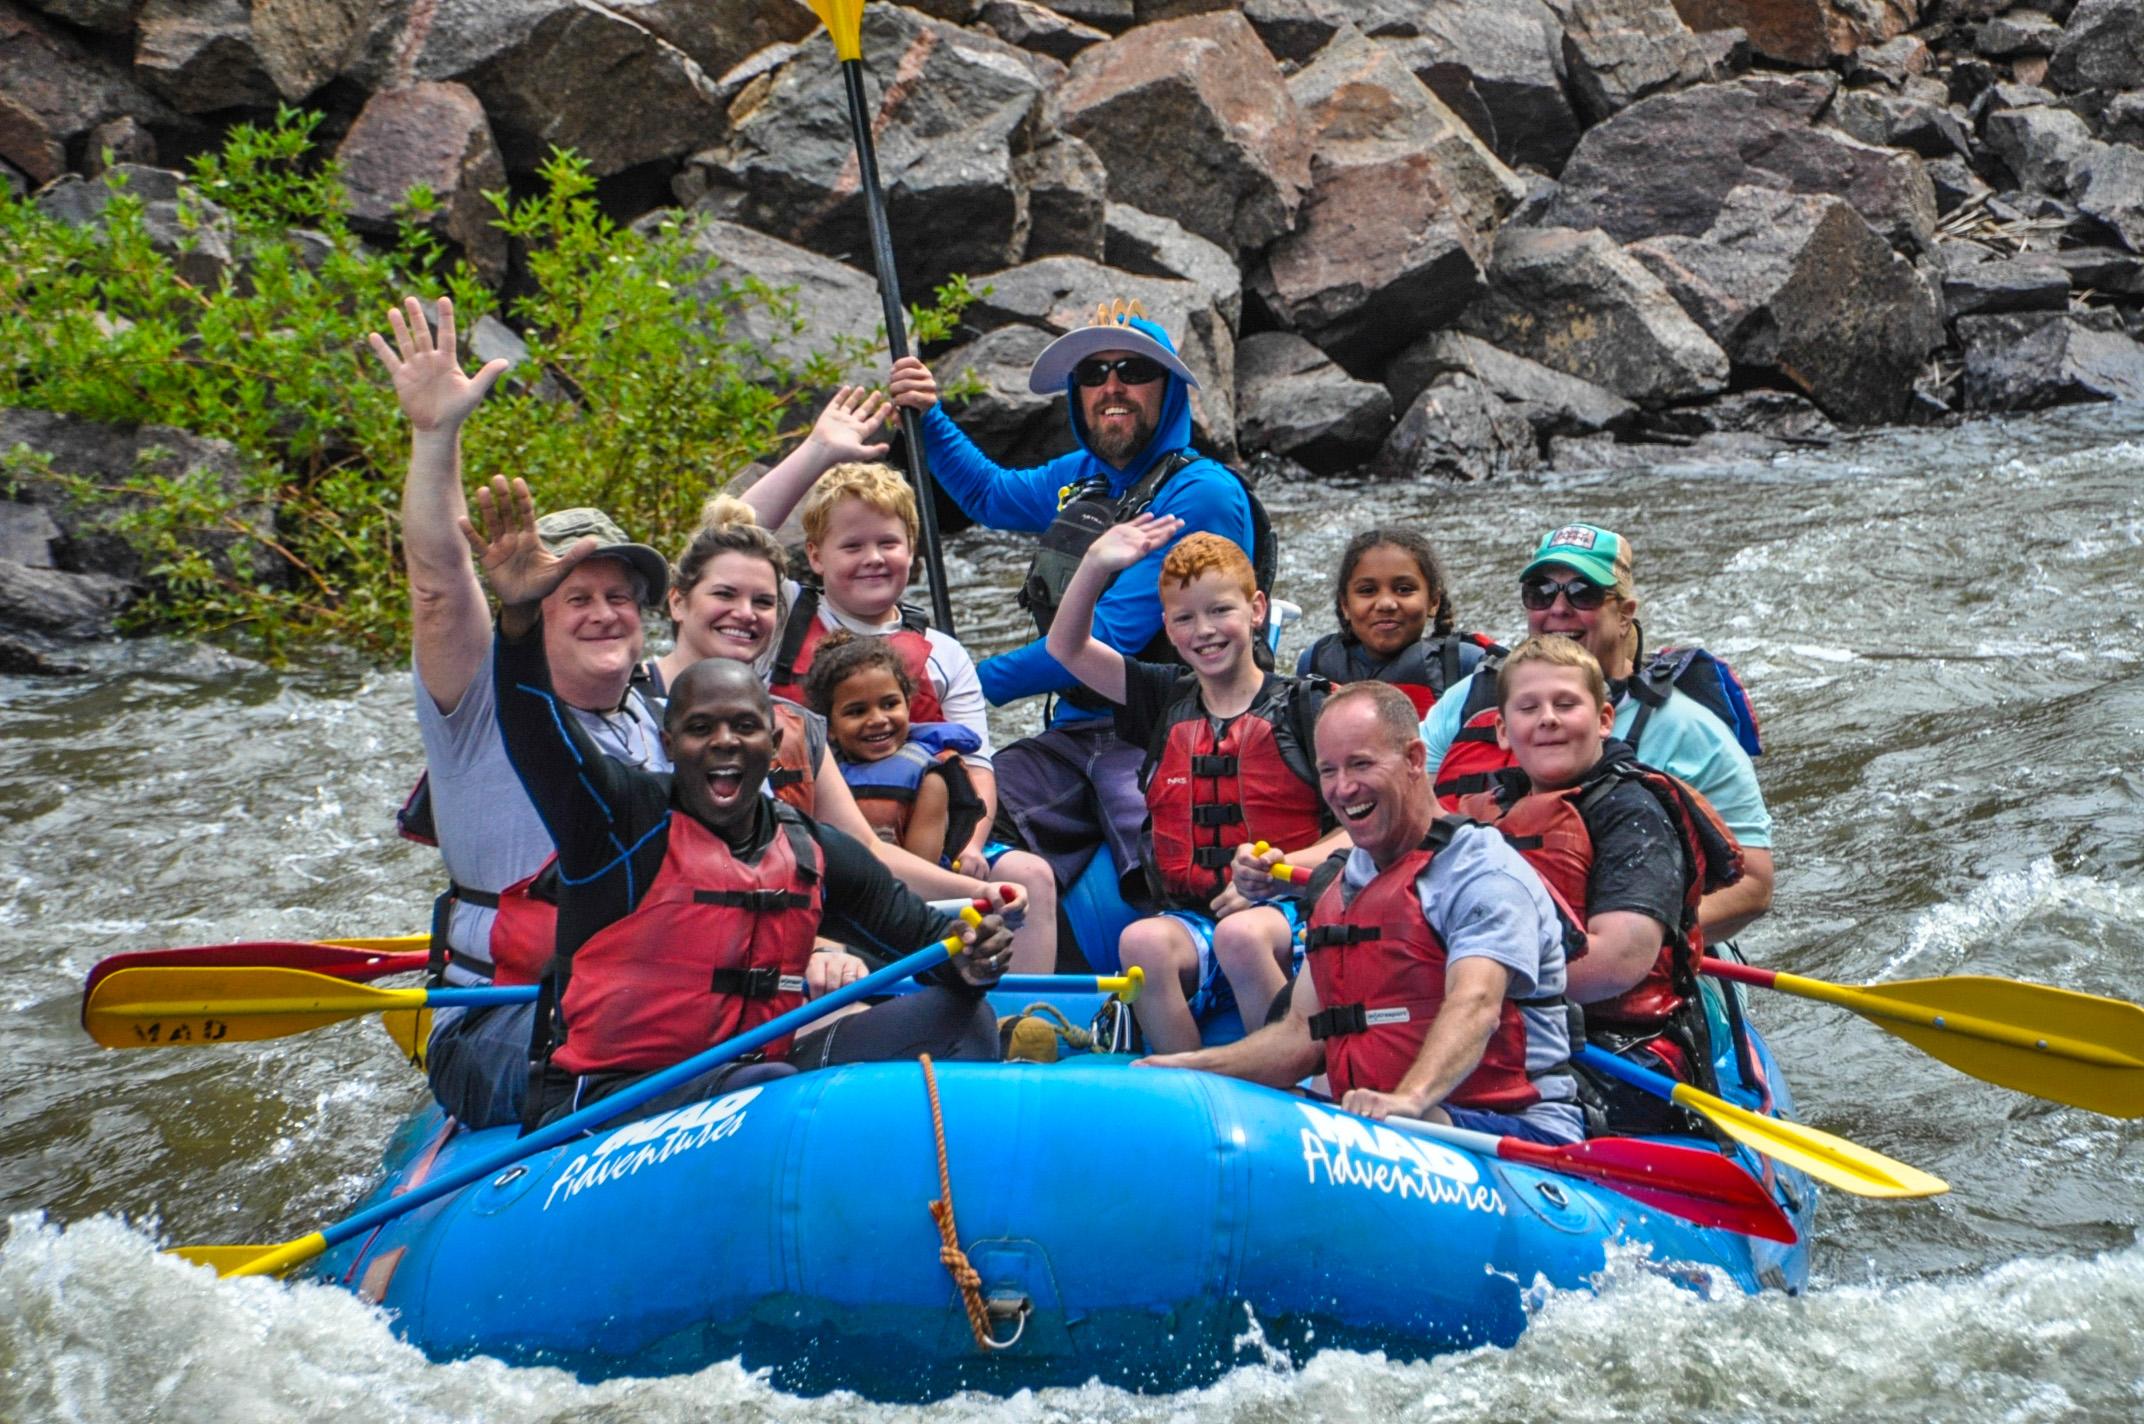 Colorado River Rating